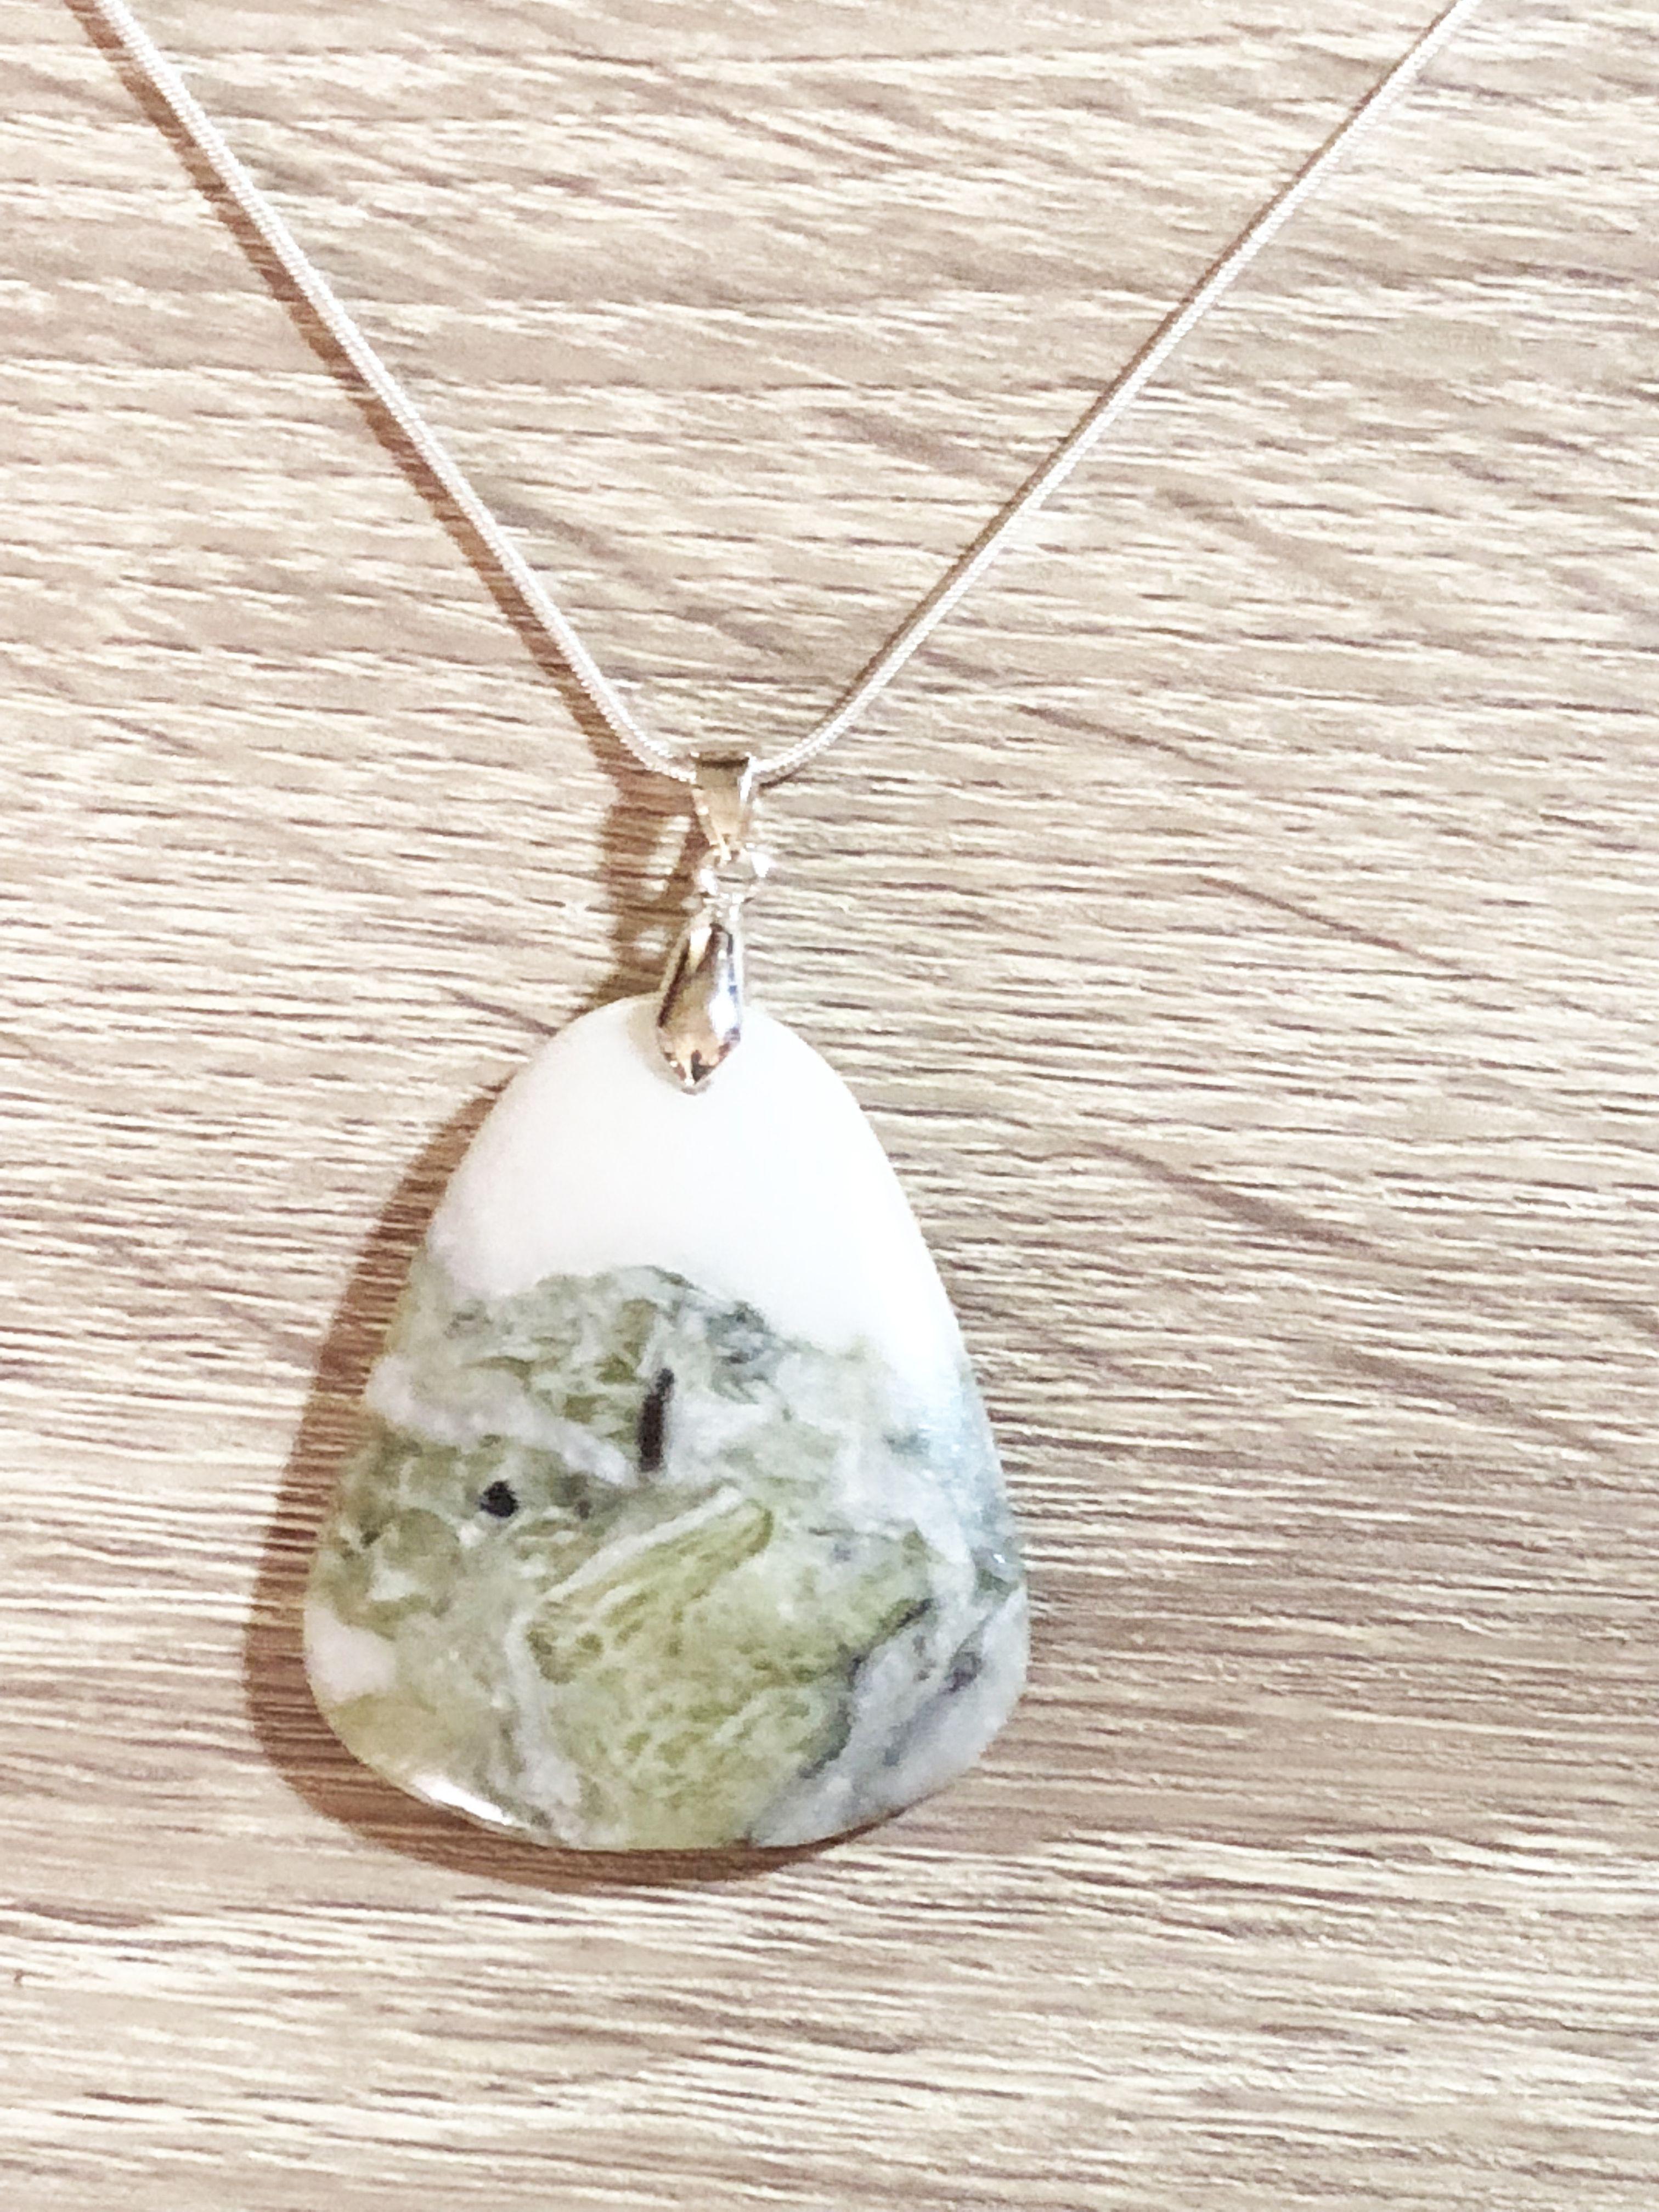 Dragons Blood Jasper,Natural Dragons Jasper Pendants,Handmade Gemstone,Jasper Stone Jewelry,Healing Gemstone Necklace,Sparkling Pendants